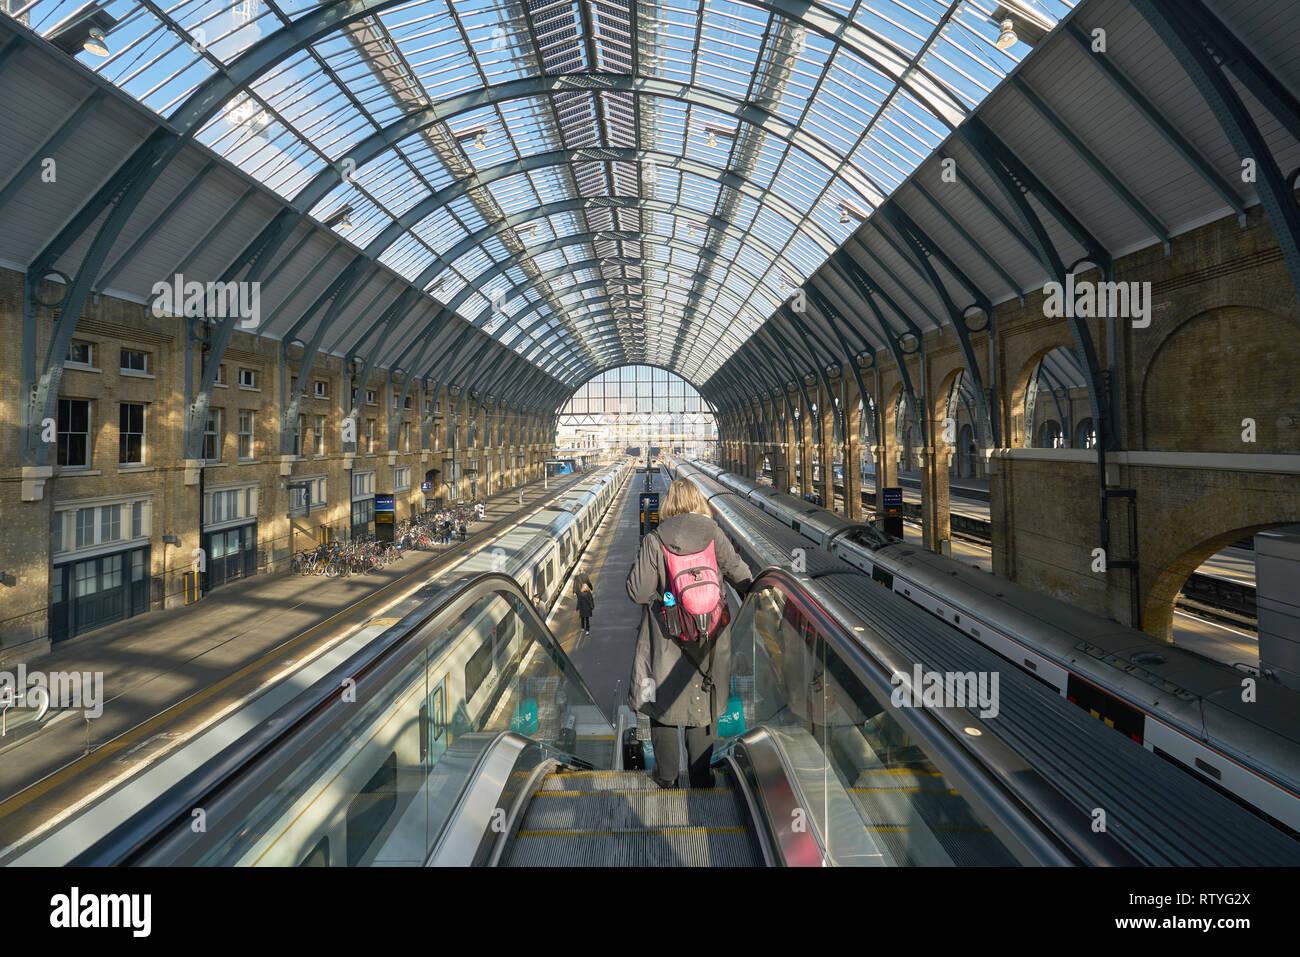 kings cross station escalators Stock Photo